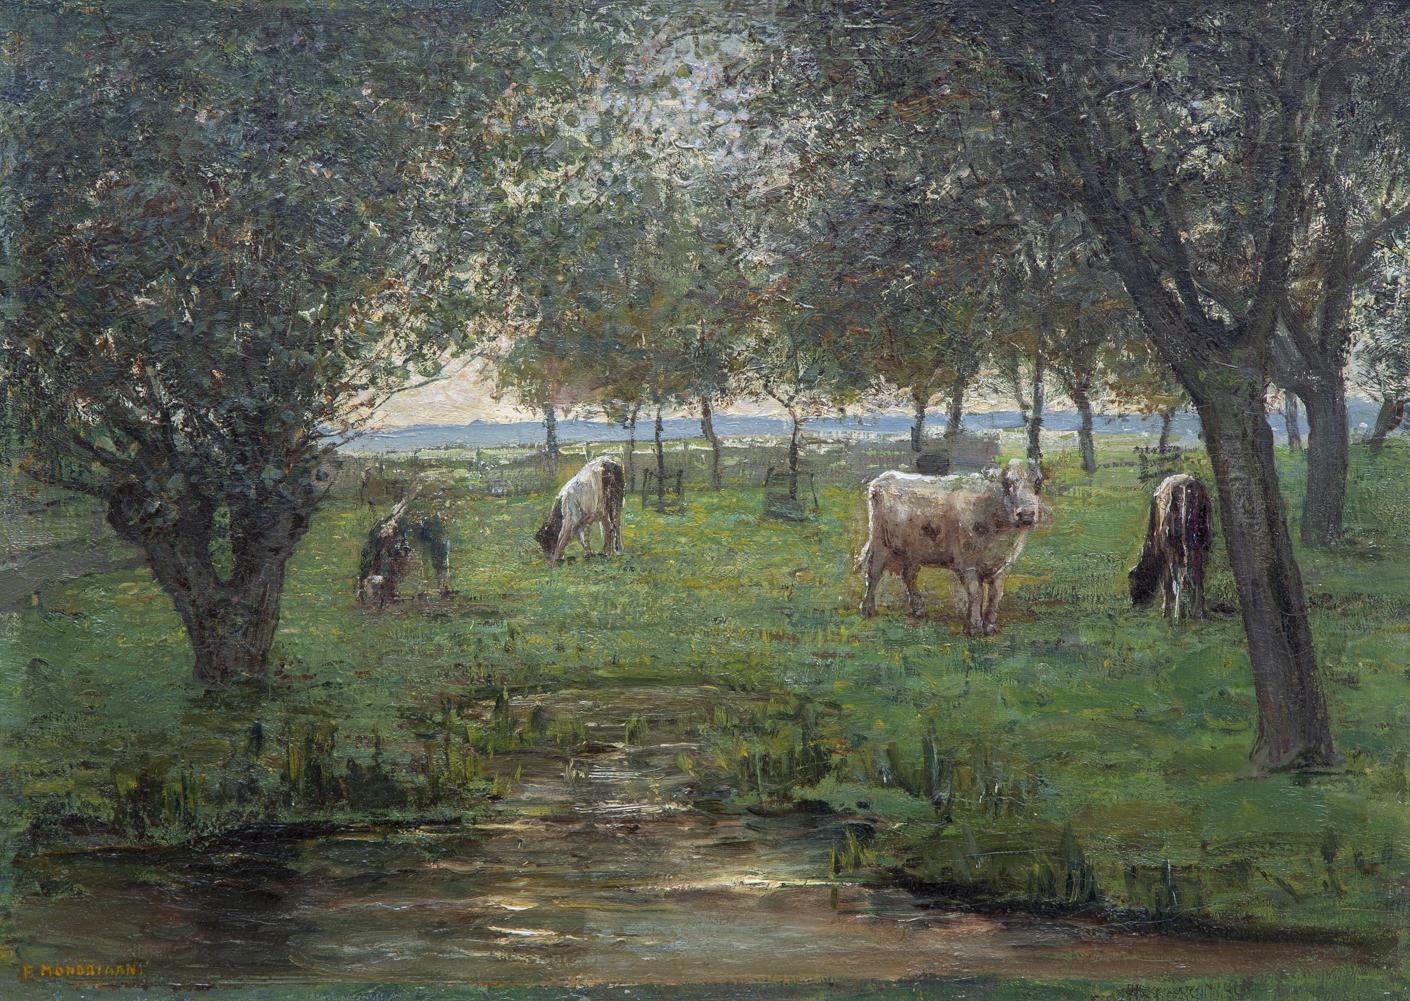 Vente Old Masters, Nineteenth Century & Early Modern Art chez Venduehuis der Notarissen te 's-Gravenhage : 164 lots